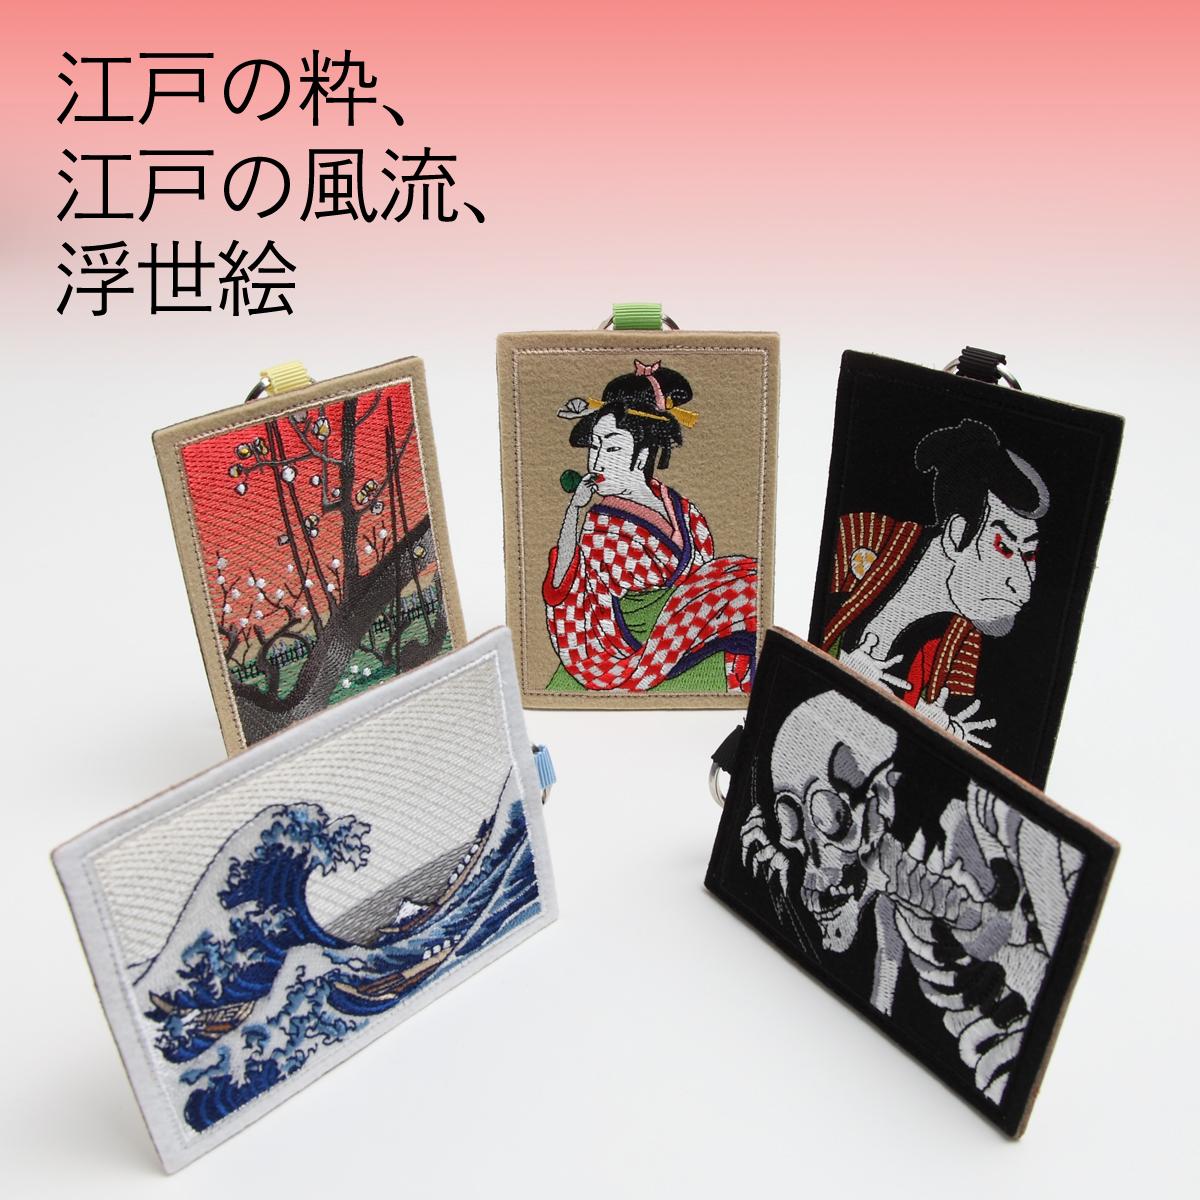 日本の名作美術